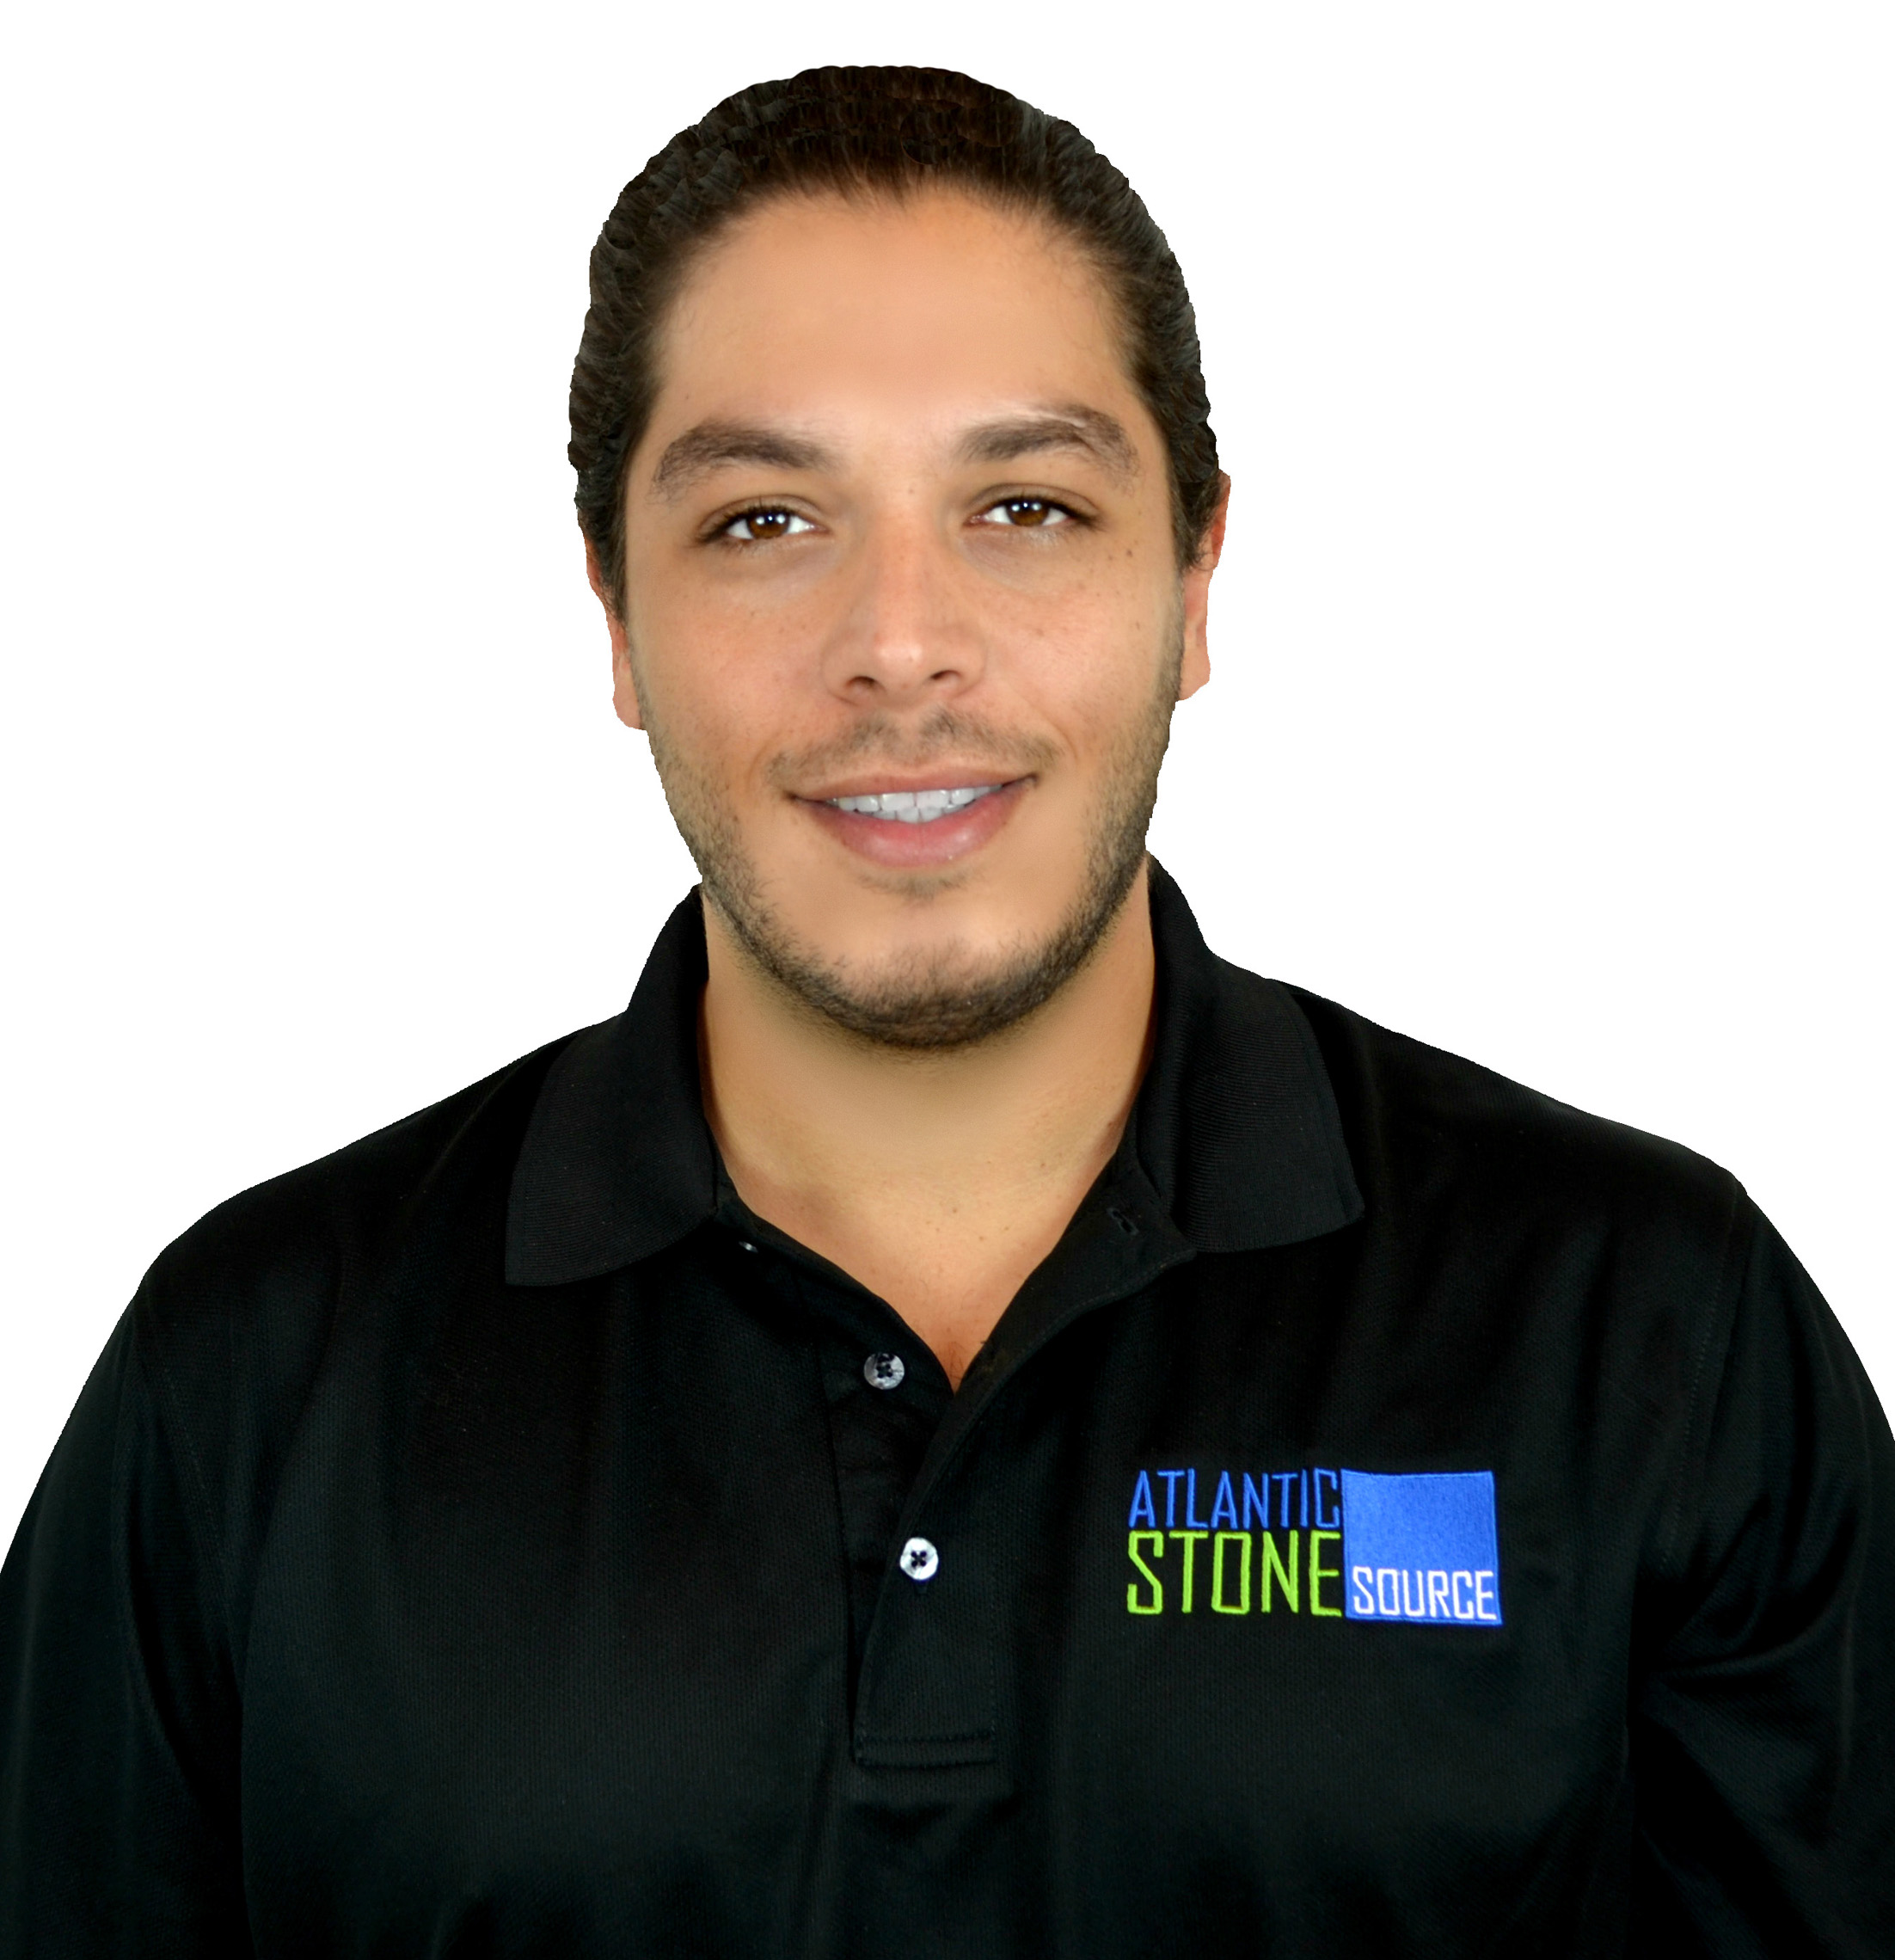 Atlantic Stone Source Sales Team Majd Naja